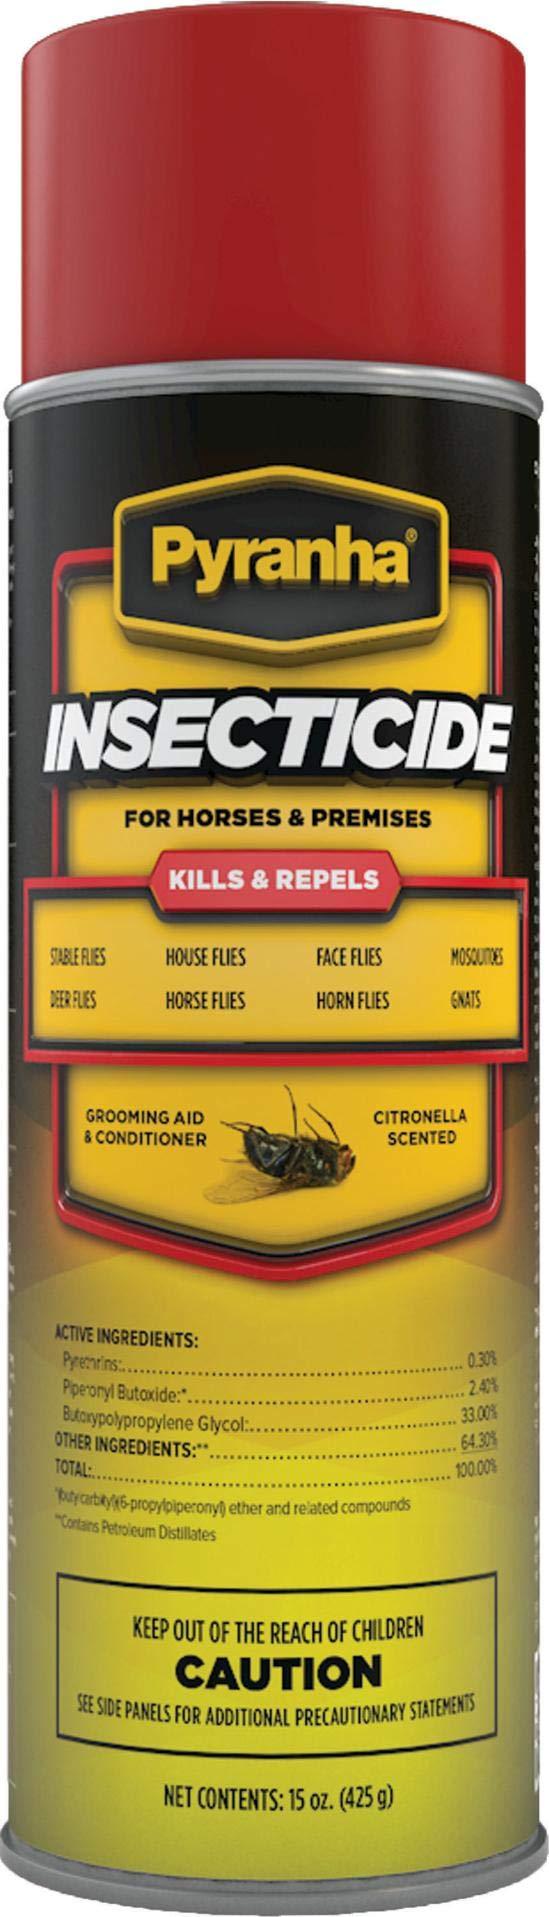 Pyranha Insecticide Aerosol, 15oz by Pyranha Incorporated